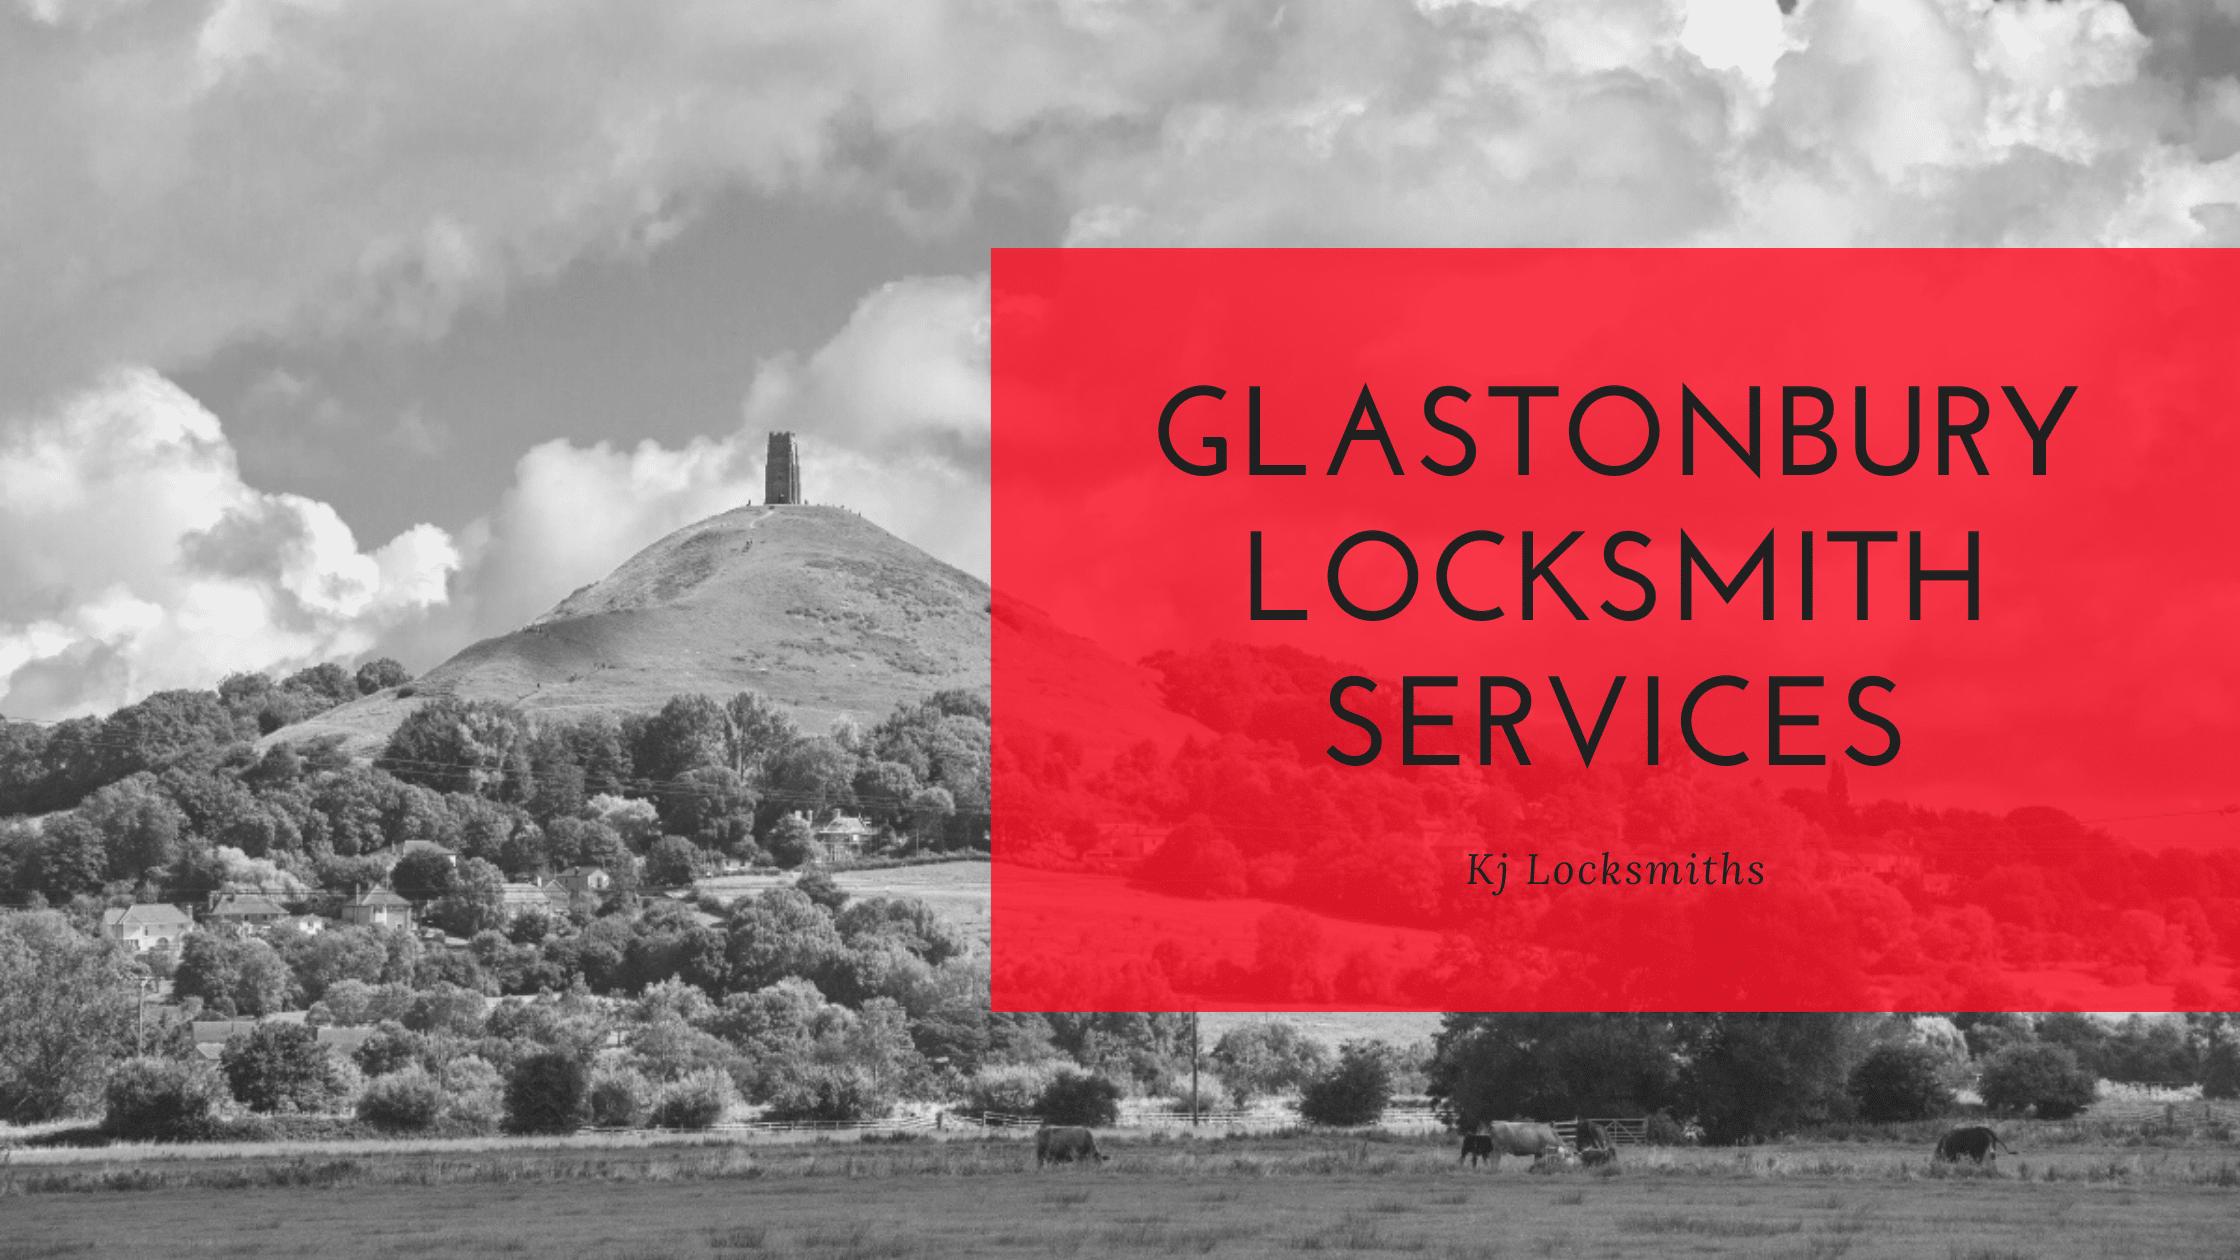 Glastonbury Locksmith Services